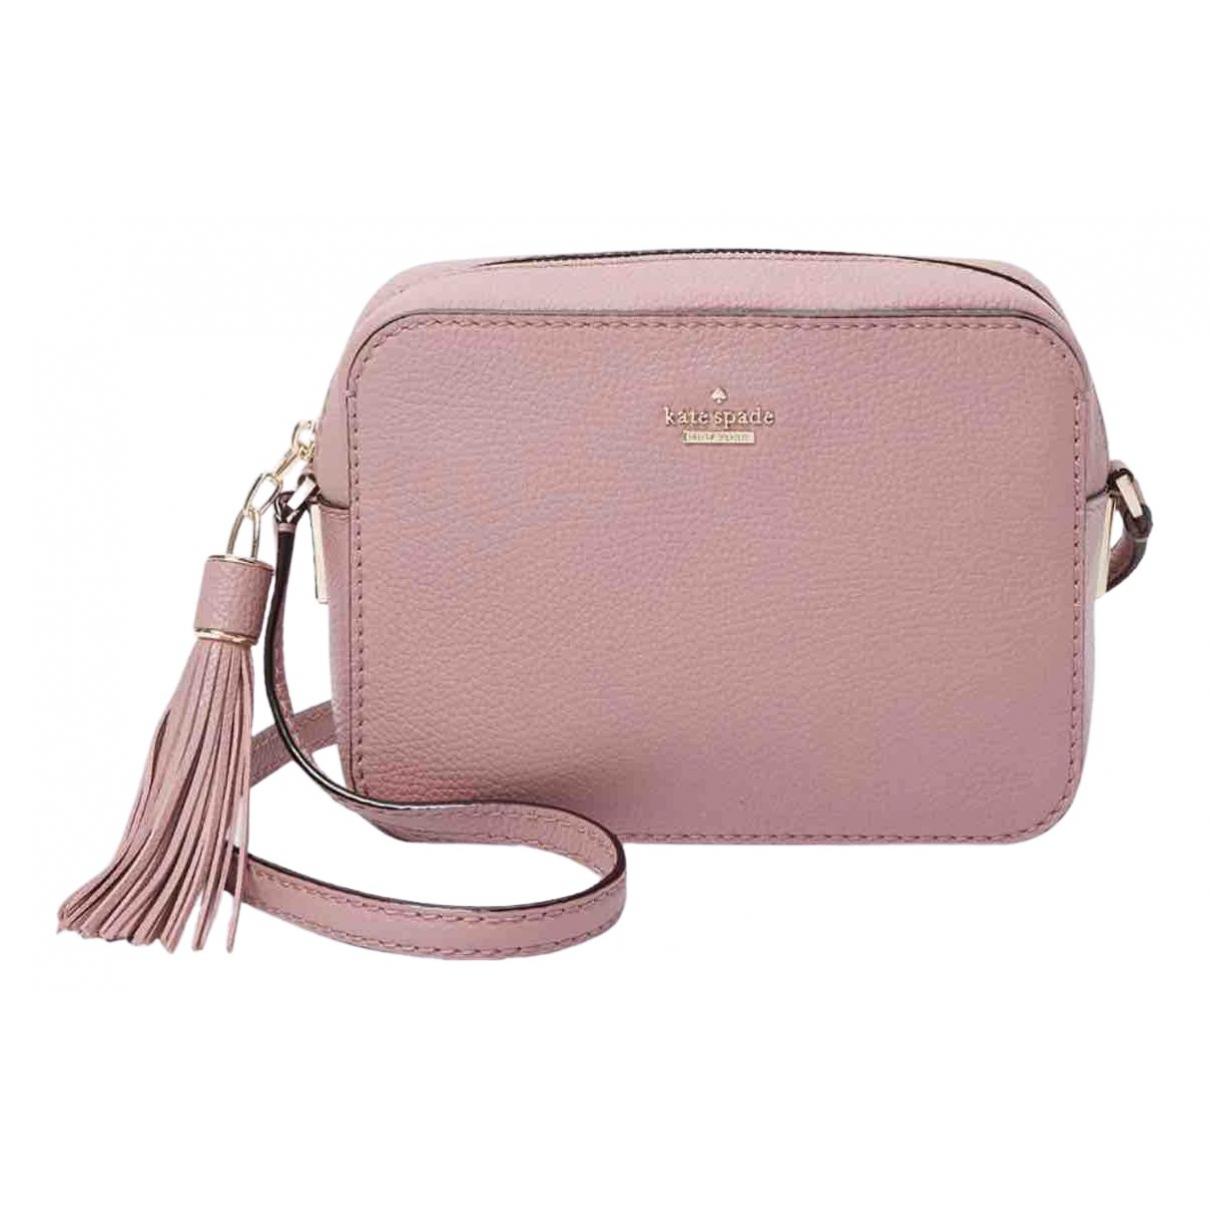 Kate Spade \N Pink Leather handbag for Women \N